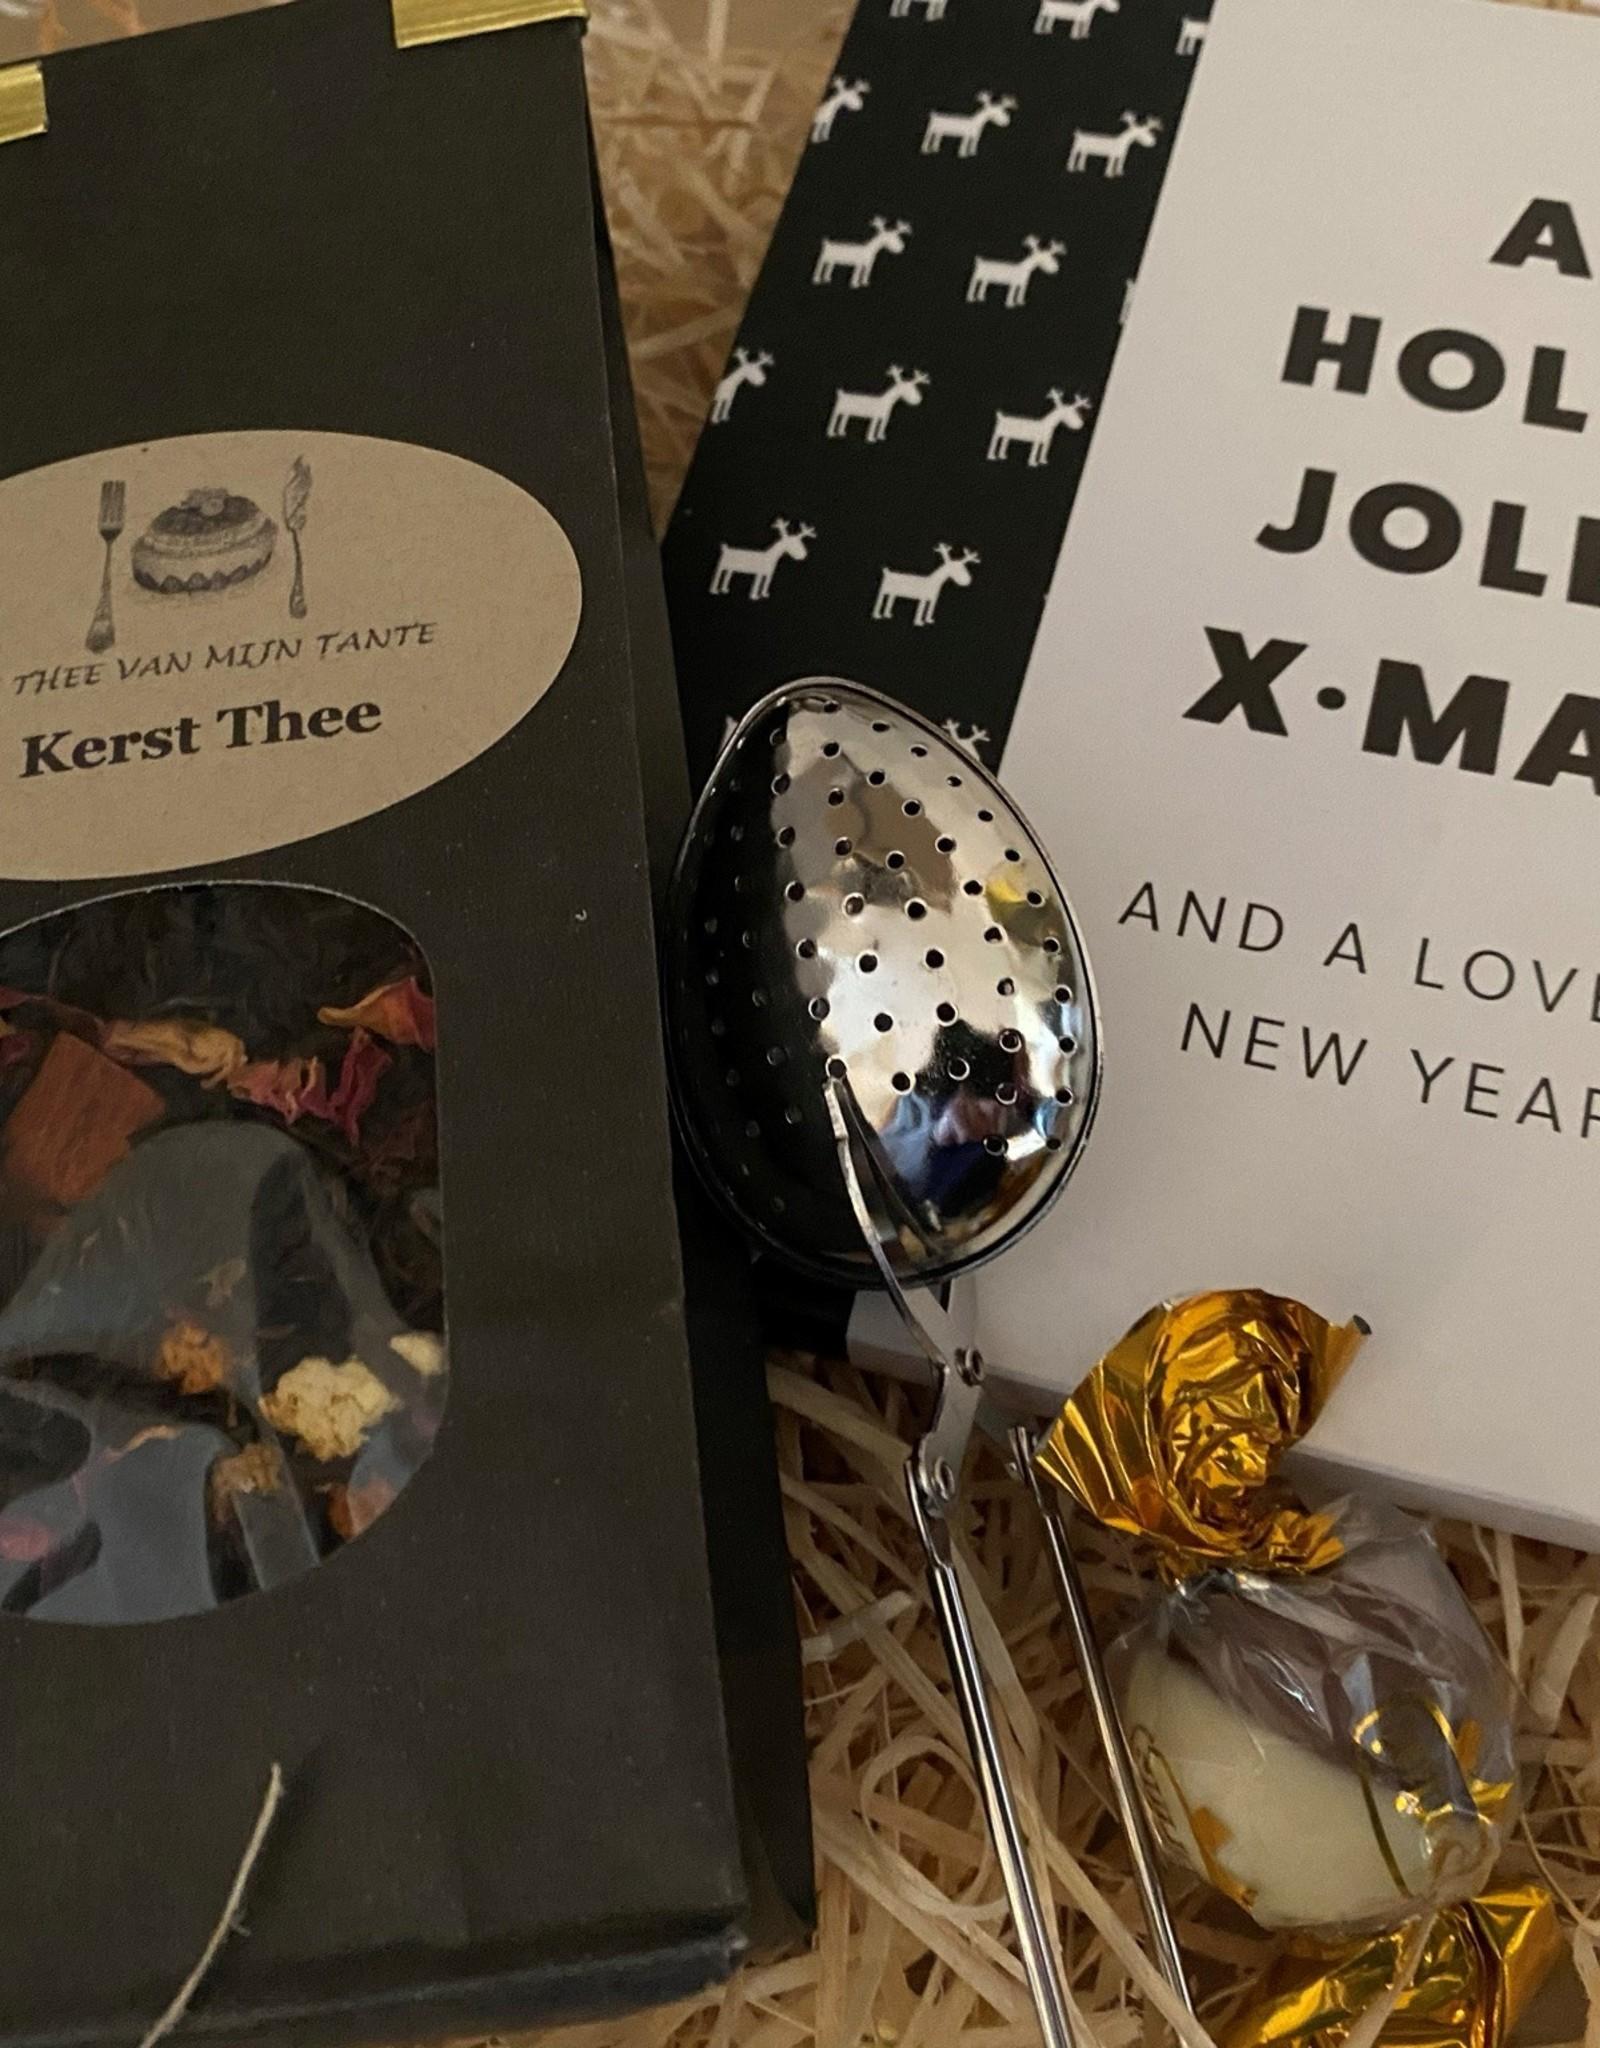 kerstpakket Kerstthee Holly Jolly Christmas